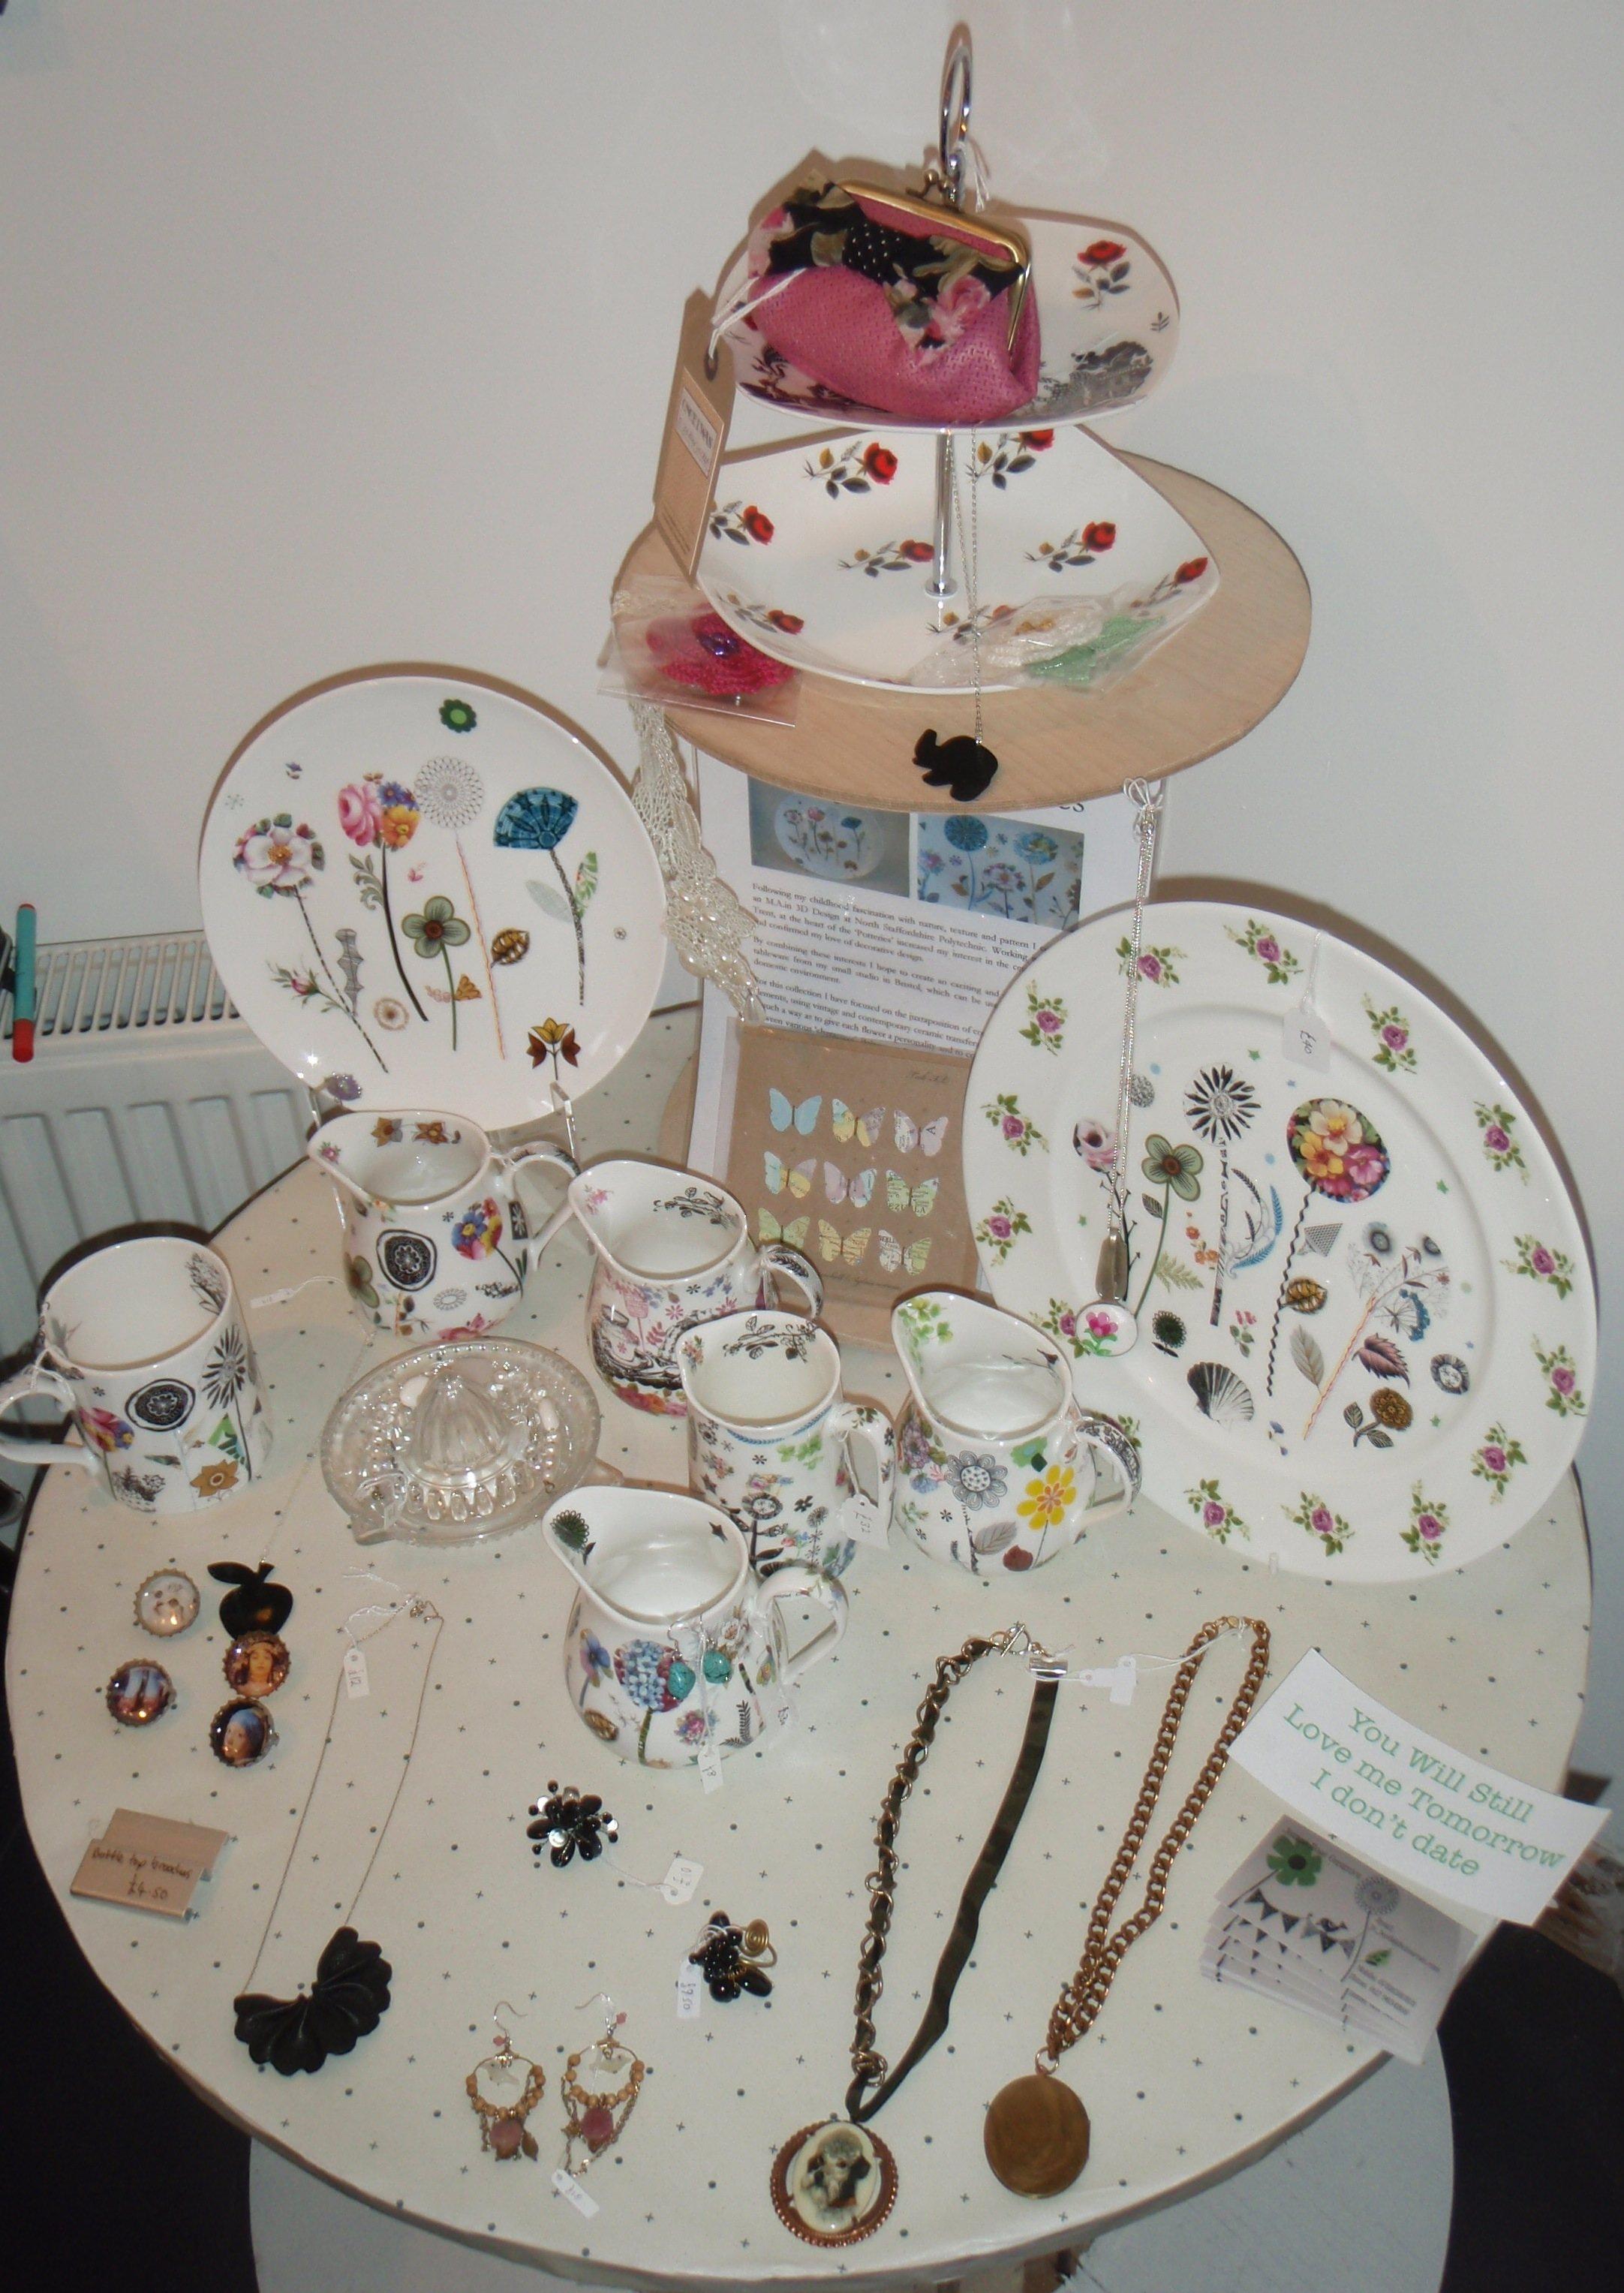 Joanna Rose Ceramics